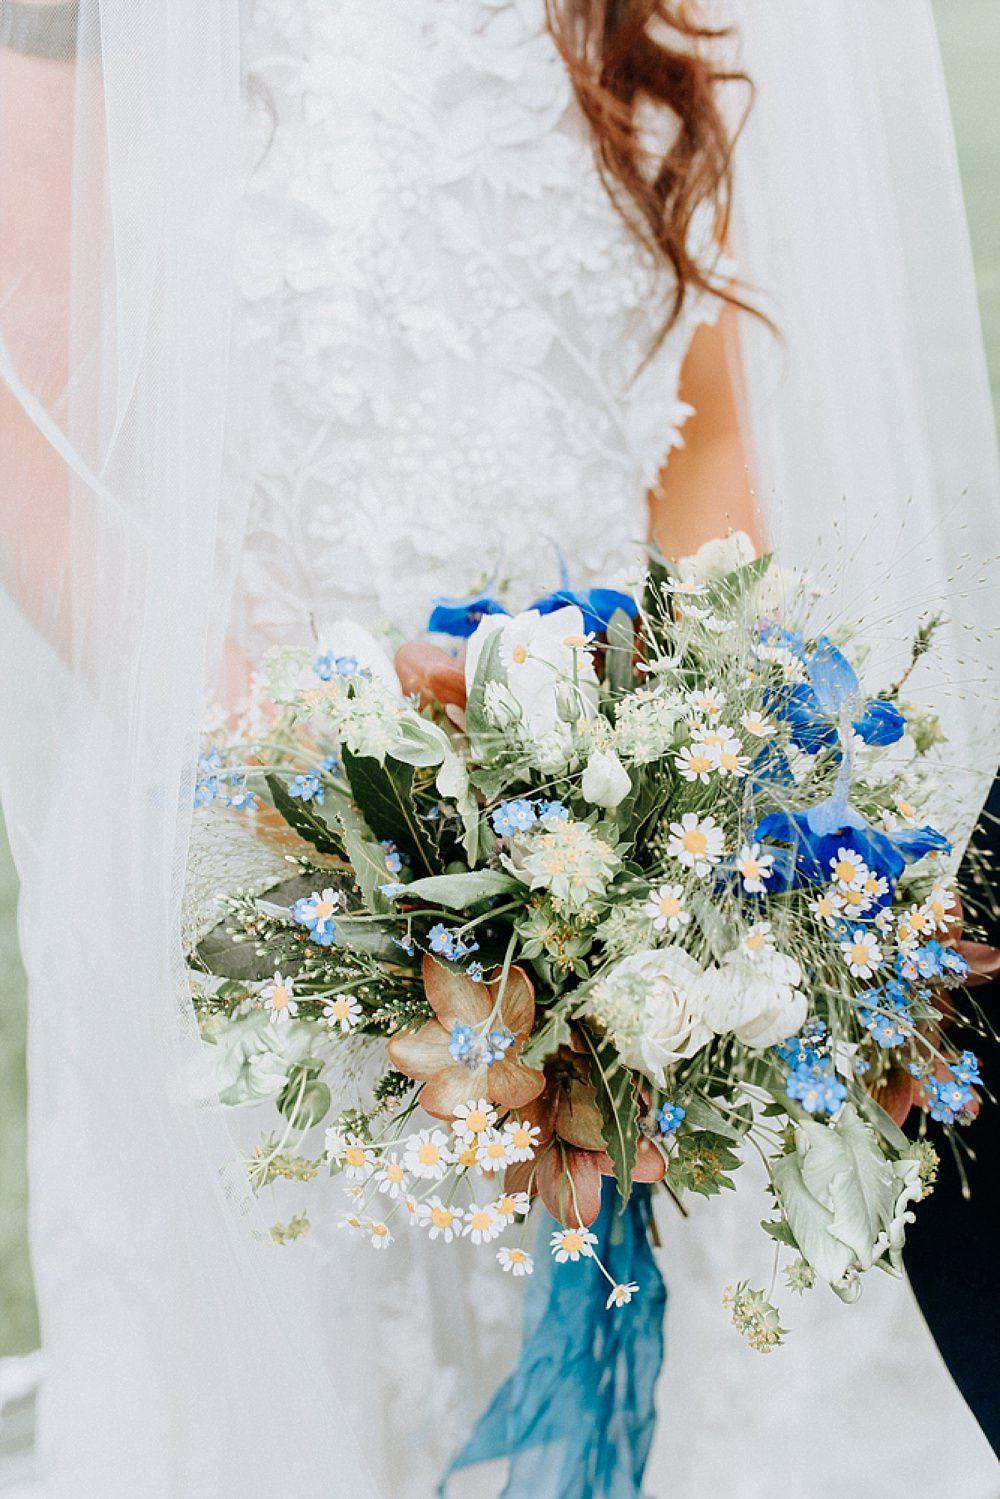 Bouquet Flowers Bride Bridal Ribbon Tulip Daisy Blue Gold Wedding Ideas Ailsa Reeve Photography